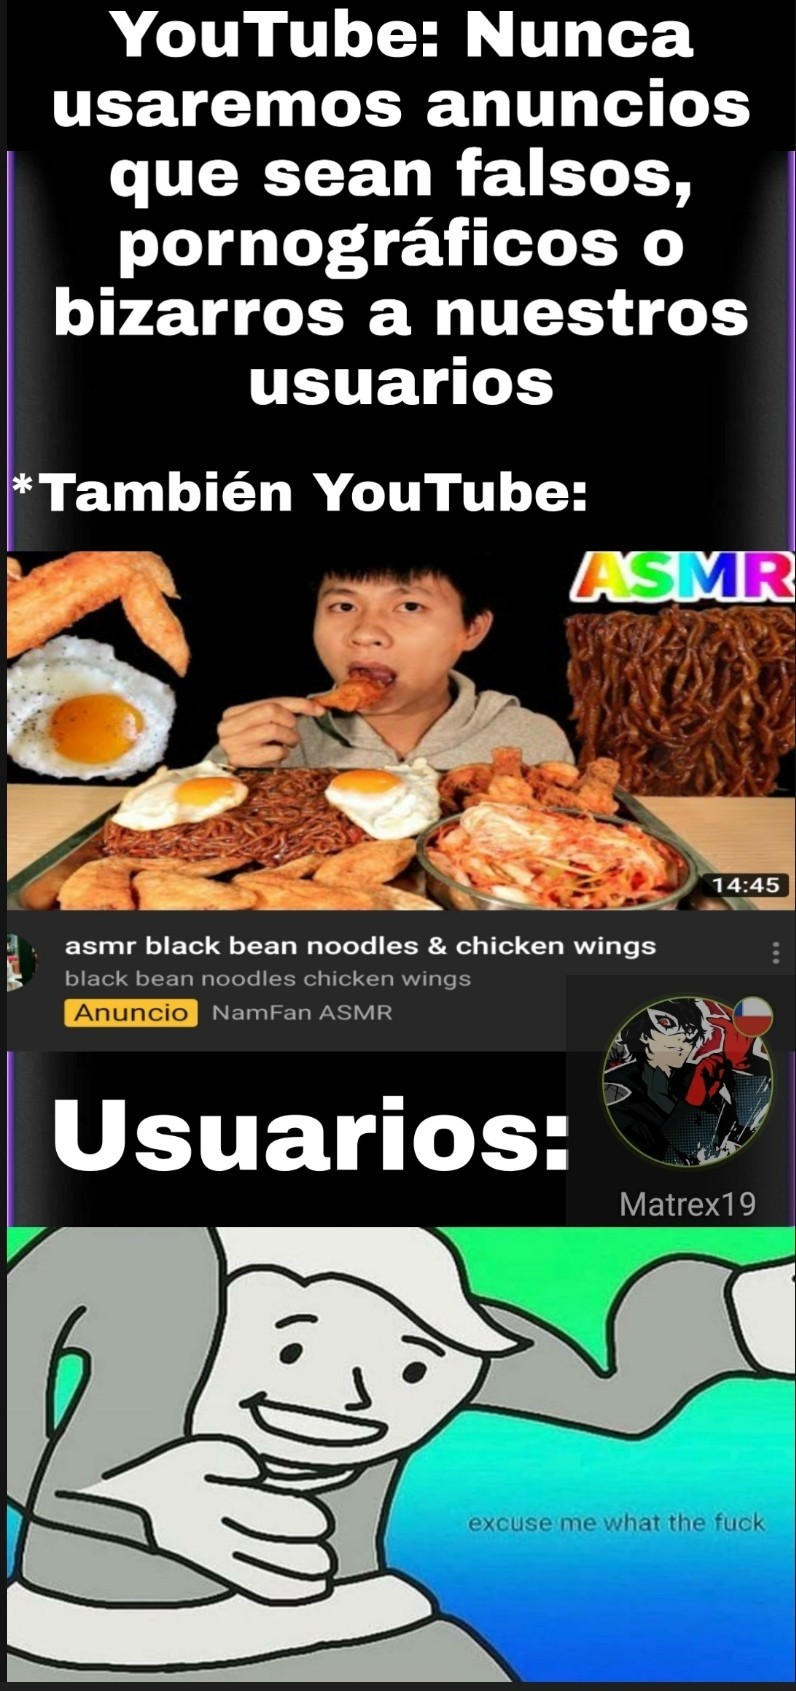 Que clase de anuncios hace Youtube hoy en día... - meme